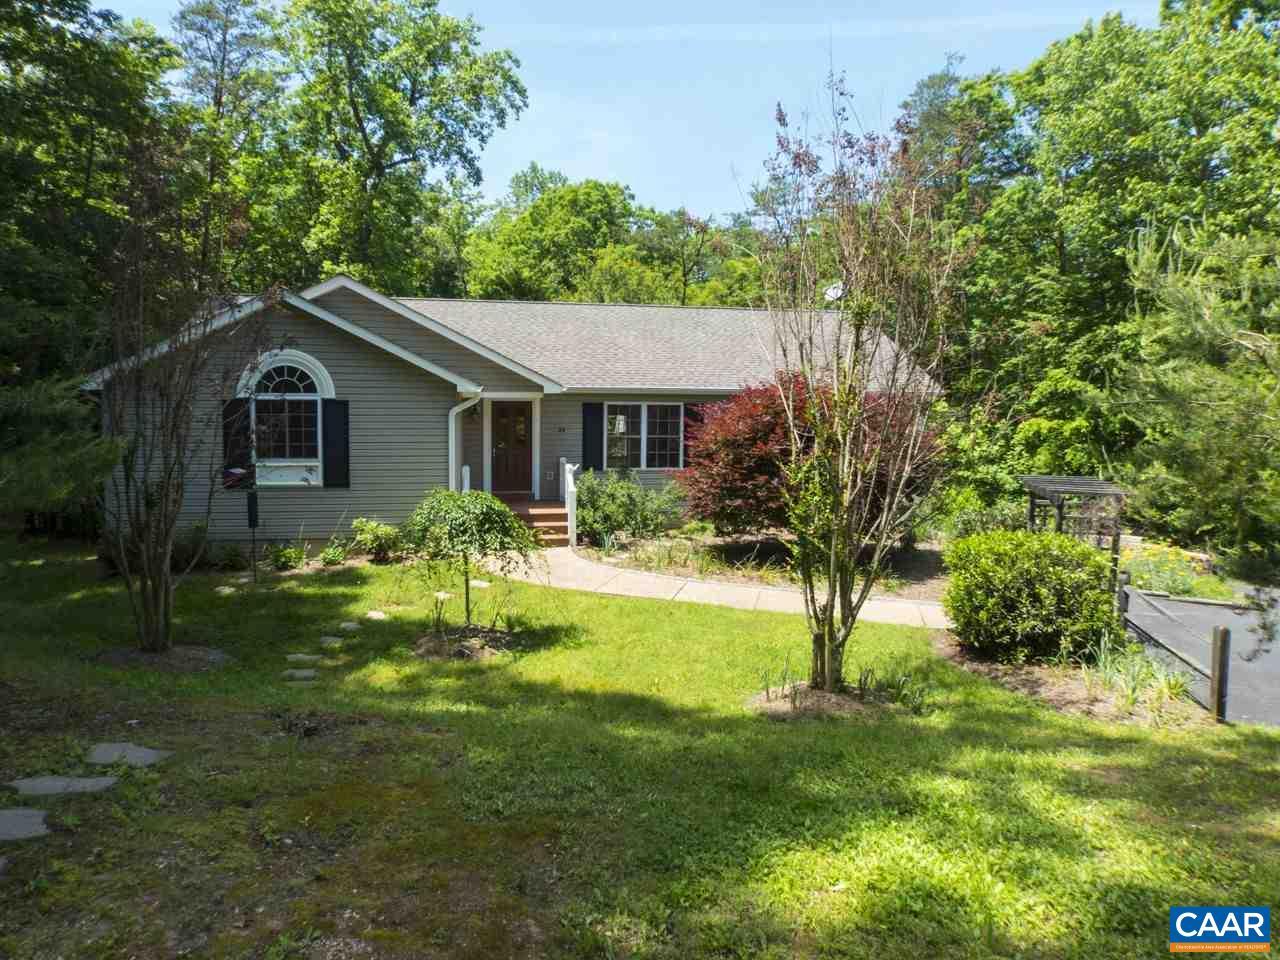 Property for sale at 24 RIVER RIDGE DR, Palmyra,  VA 22963